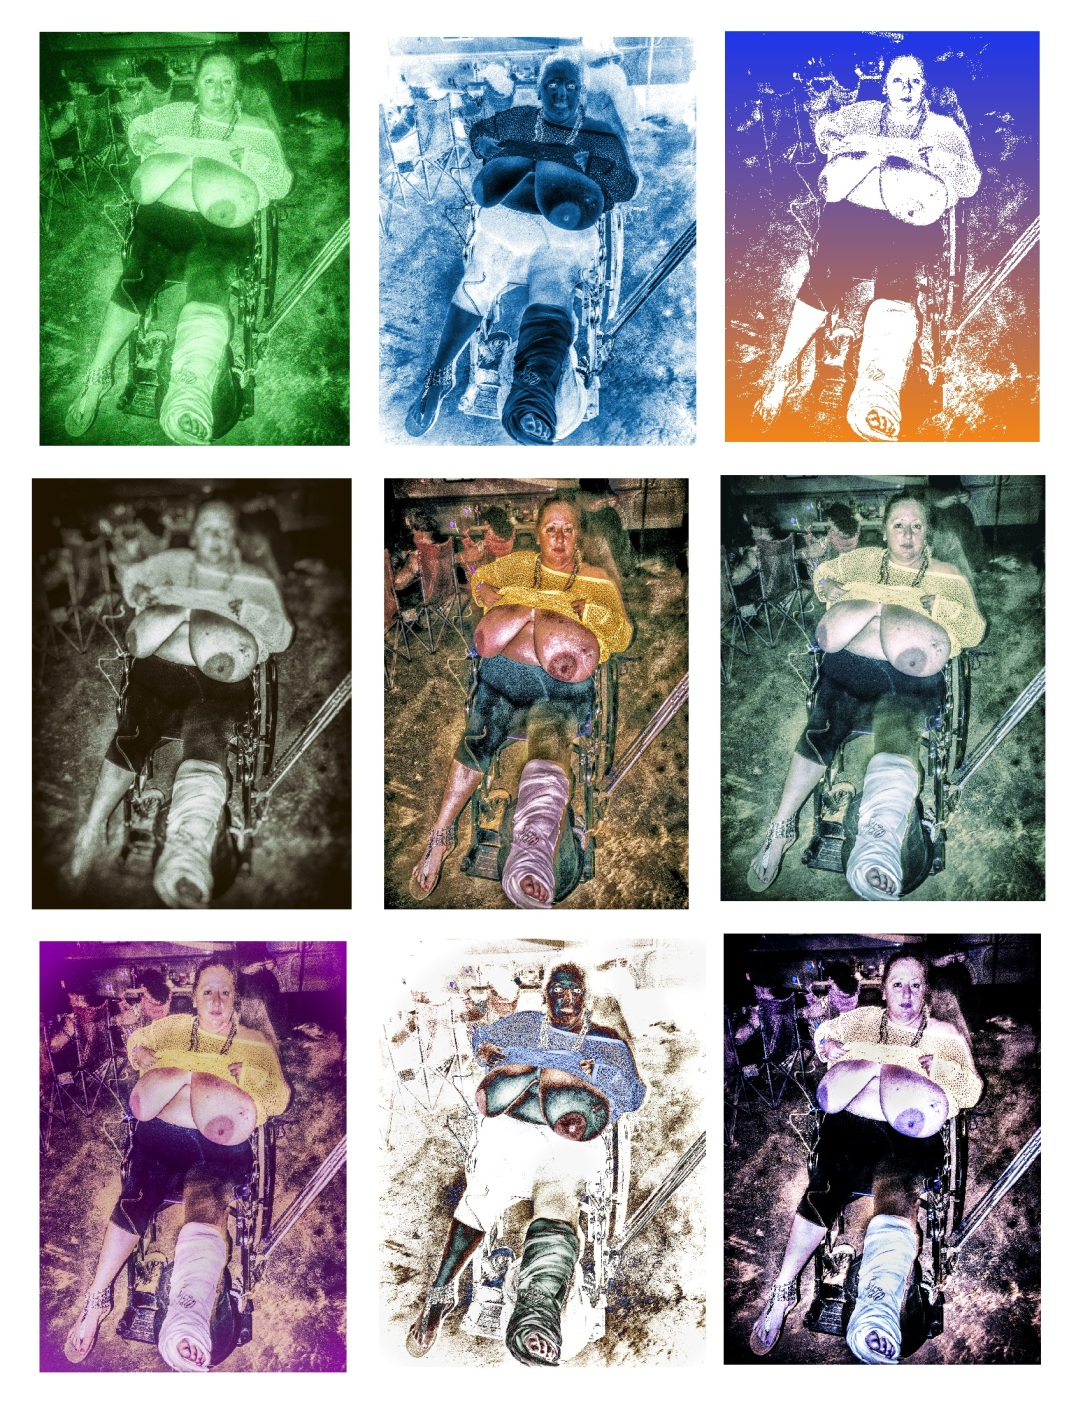 Wheelchair Collage copyright 2012 Daniel D. Teoli Jr. mr